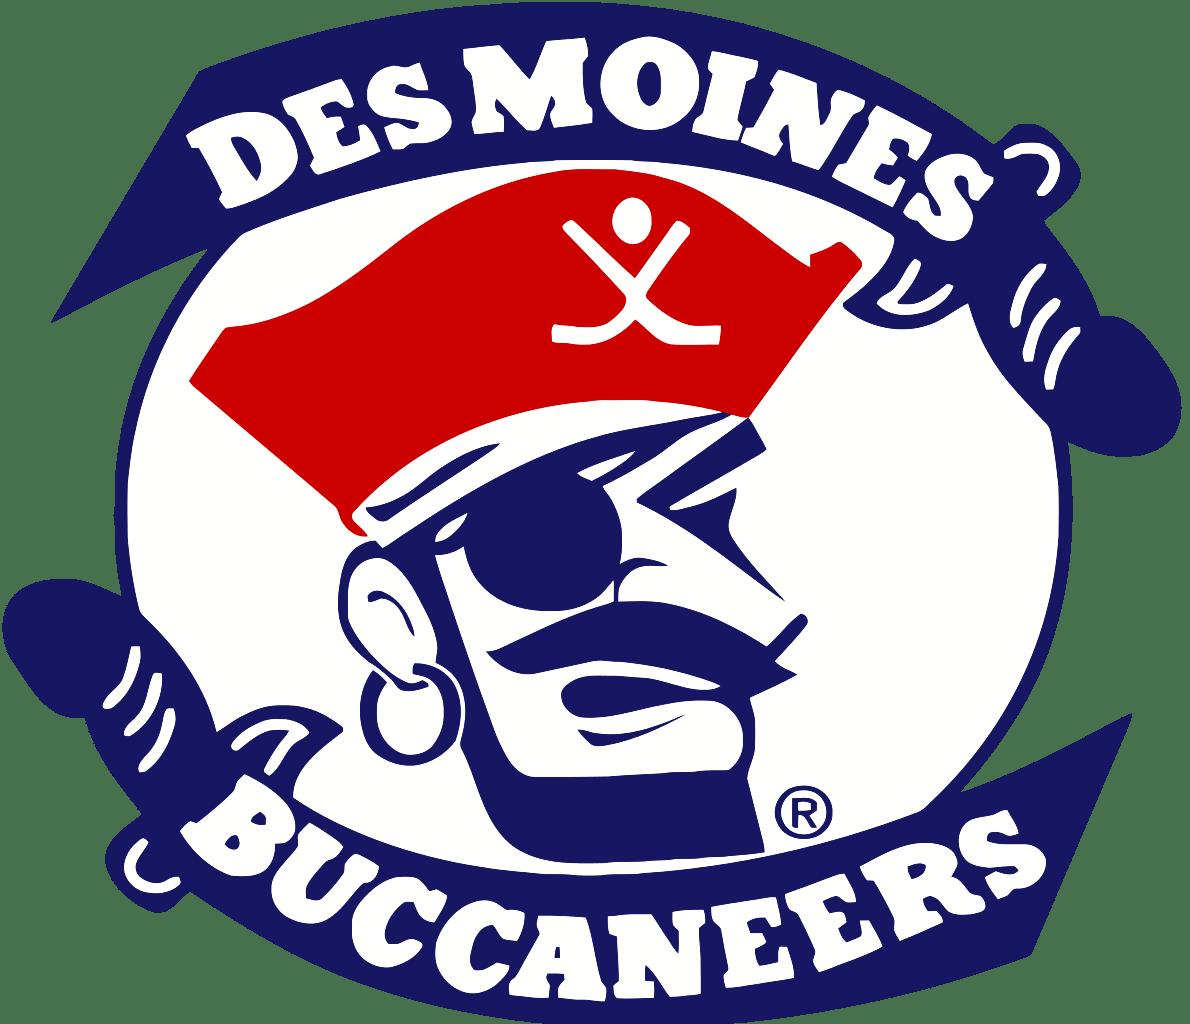 Des Moines Buccaneers Logo Transparent Png Stickpng